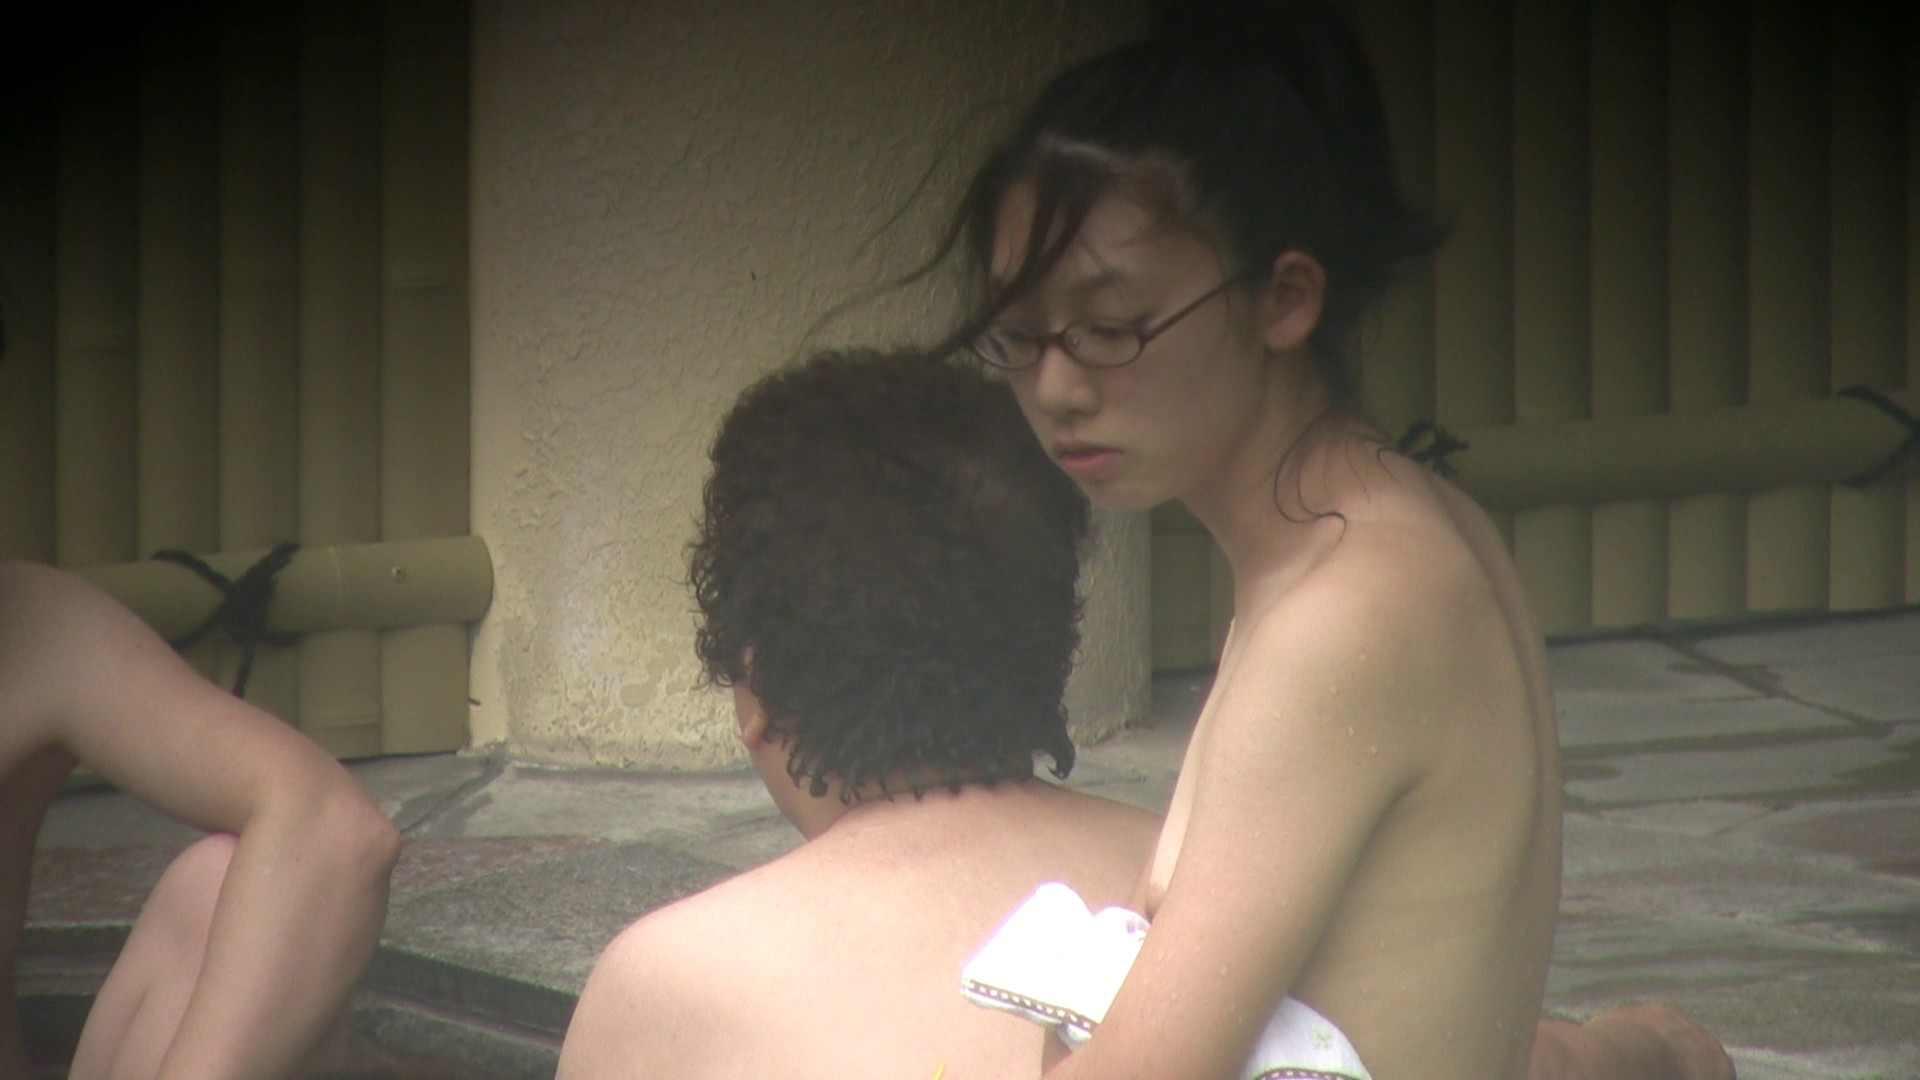 Aquaな露天風呂Vol.138 露天風呂突入   美しいOLの裸体  92pic 49